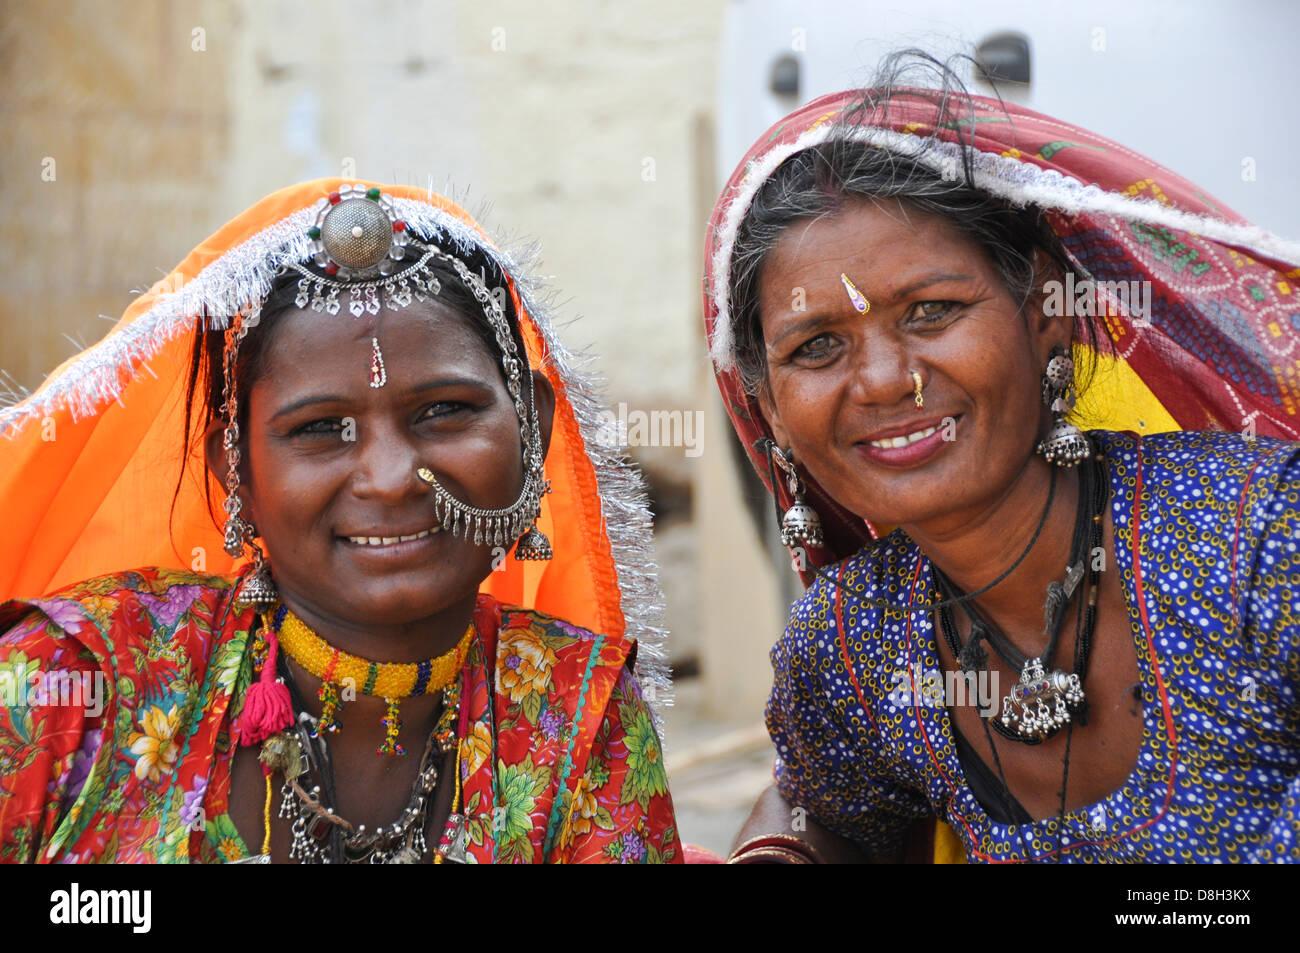 Les femmes en sari Rajasthani traditionnelle robe et bijoux Jodhpur, Rajasthan, India Banque D'Images